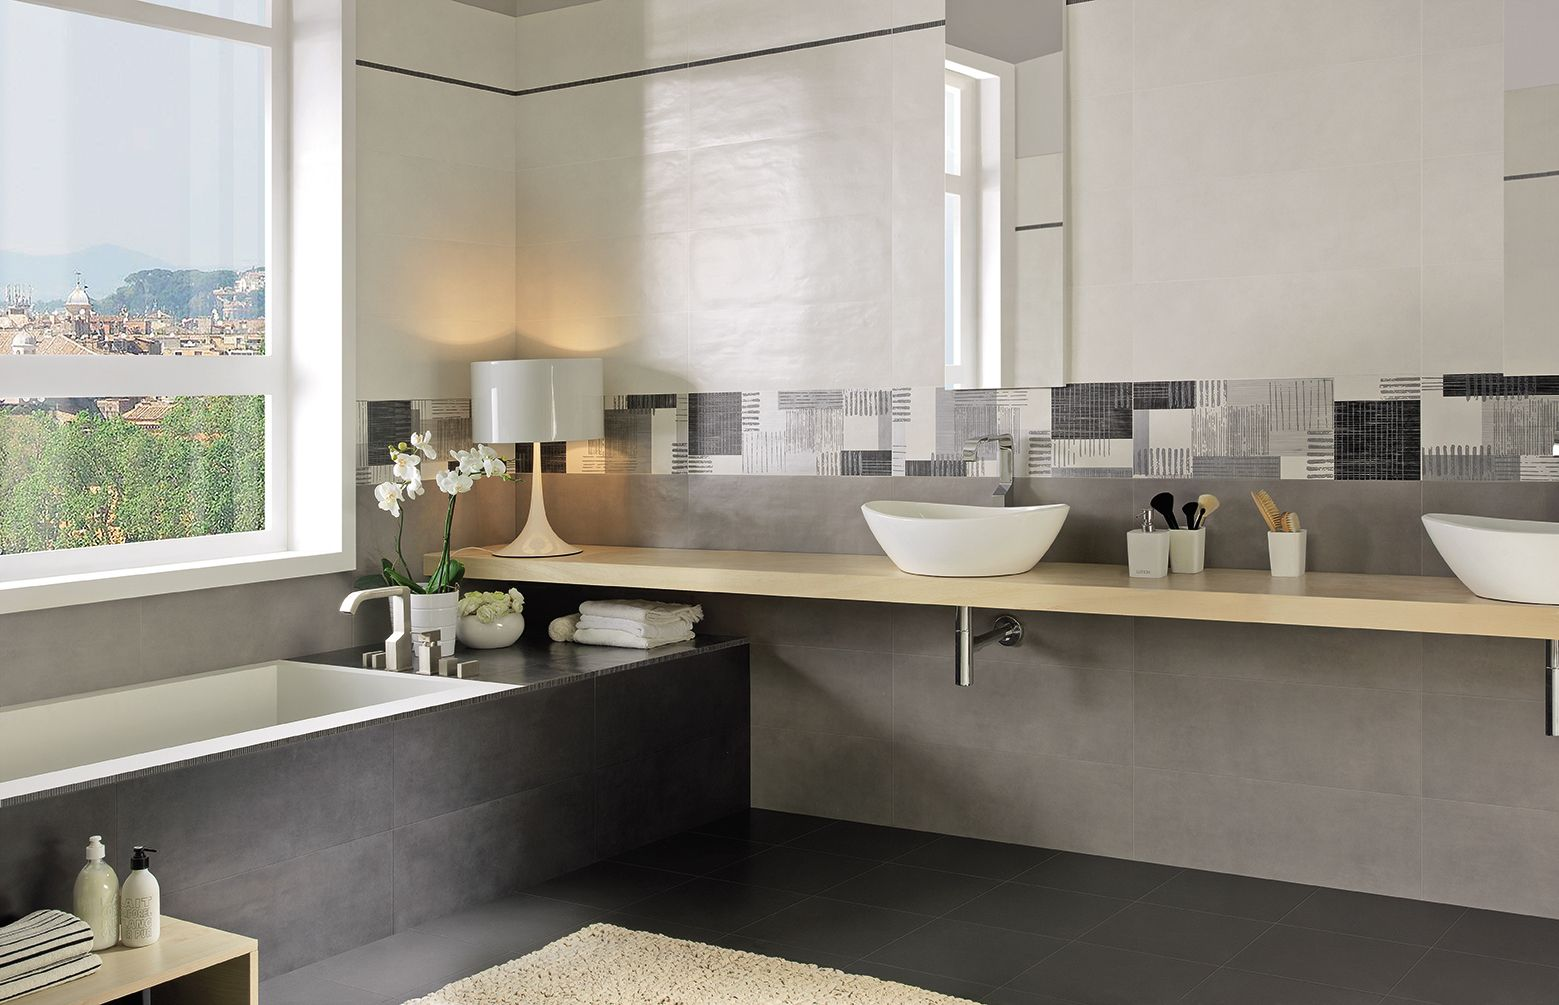 Serie manhattan armonie by arte casa interior bagni moderni pinterest bagno bagni - Ricci casa bagni ...